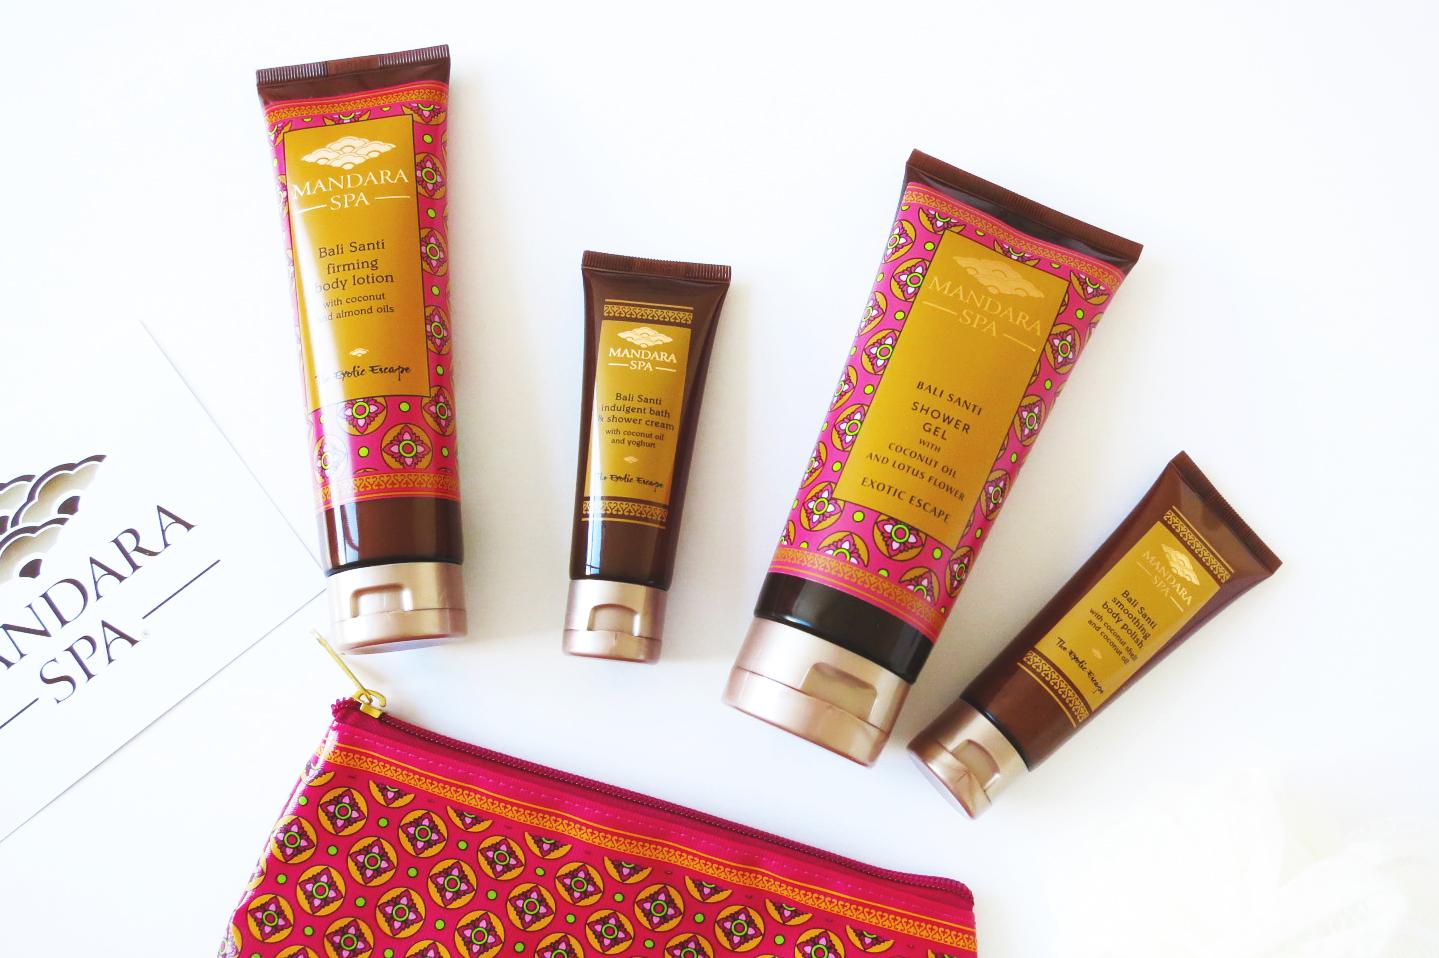 Mandara Spa - Bath and Body